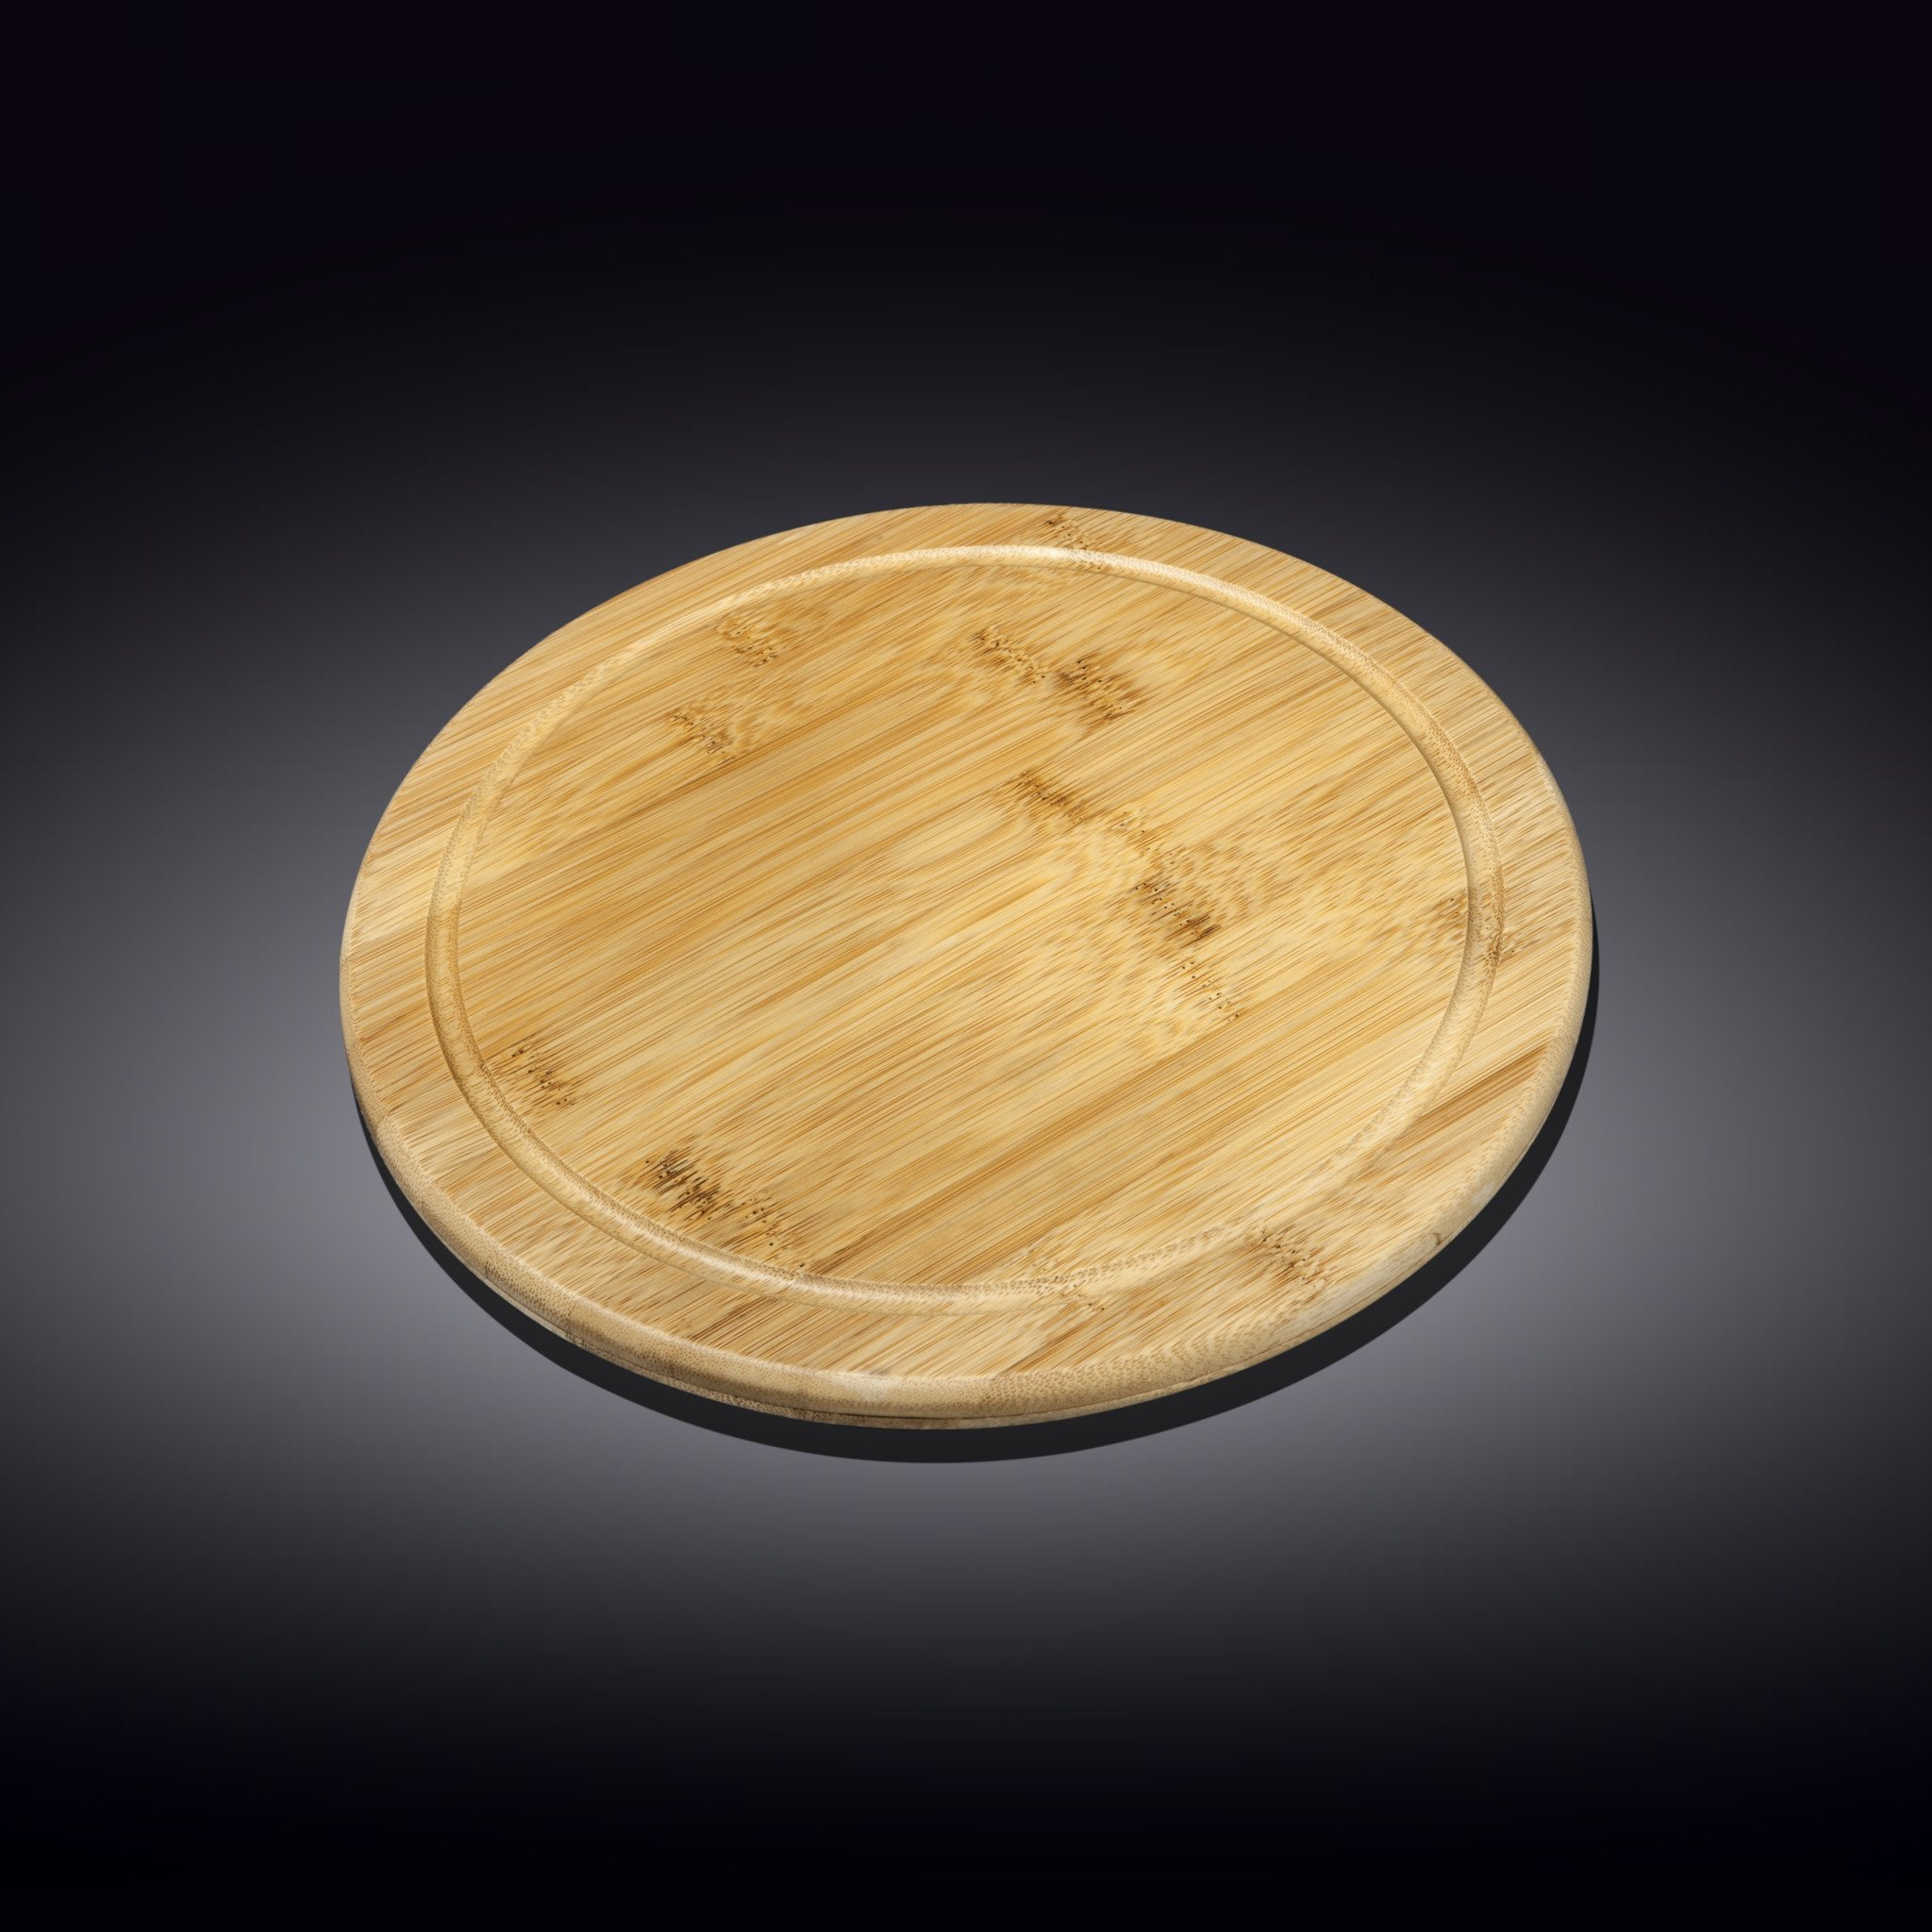 Сервировочная подставка 20.5см  Бамбук Wilmax  круглая